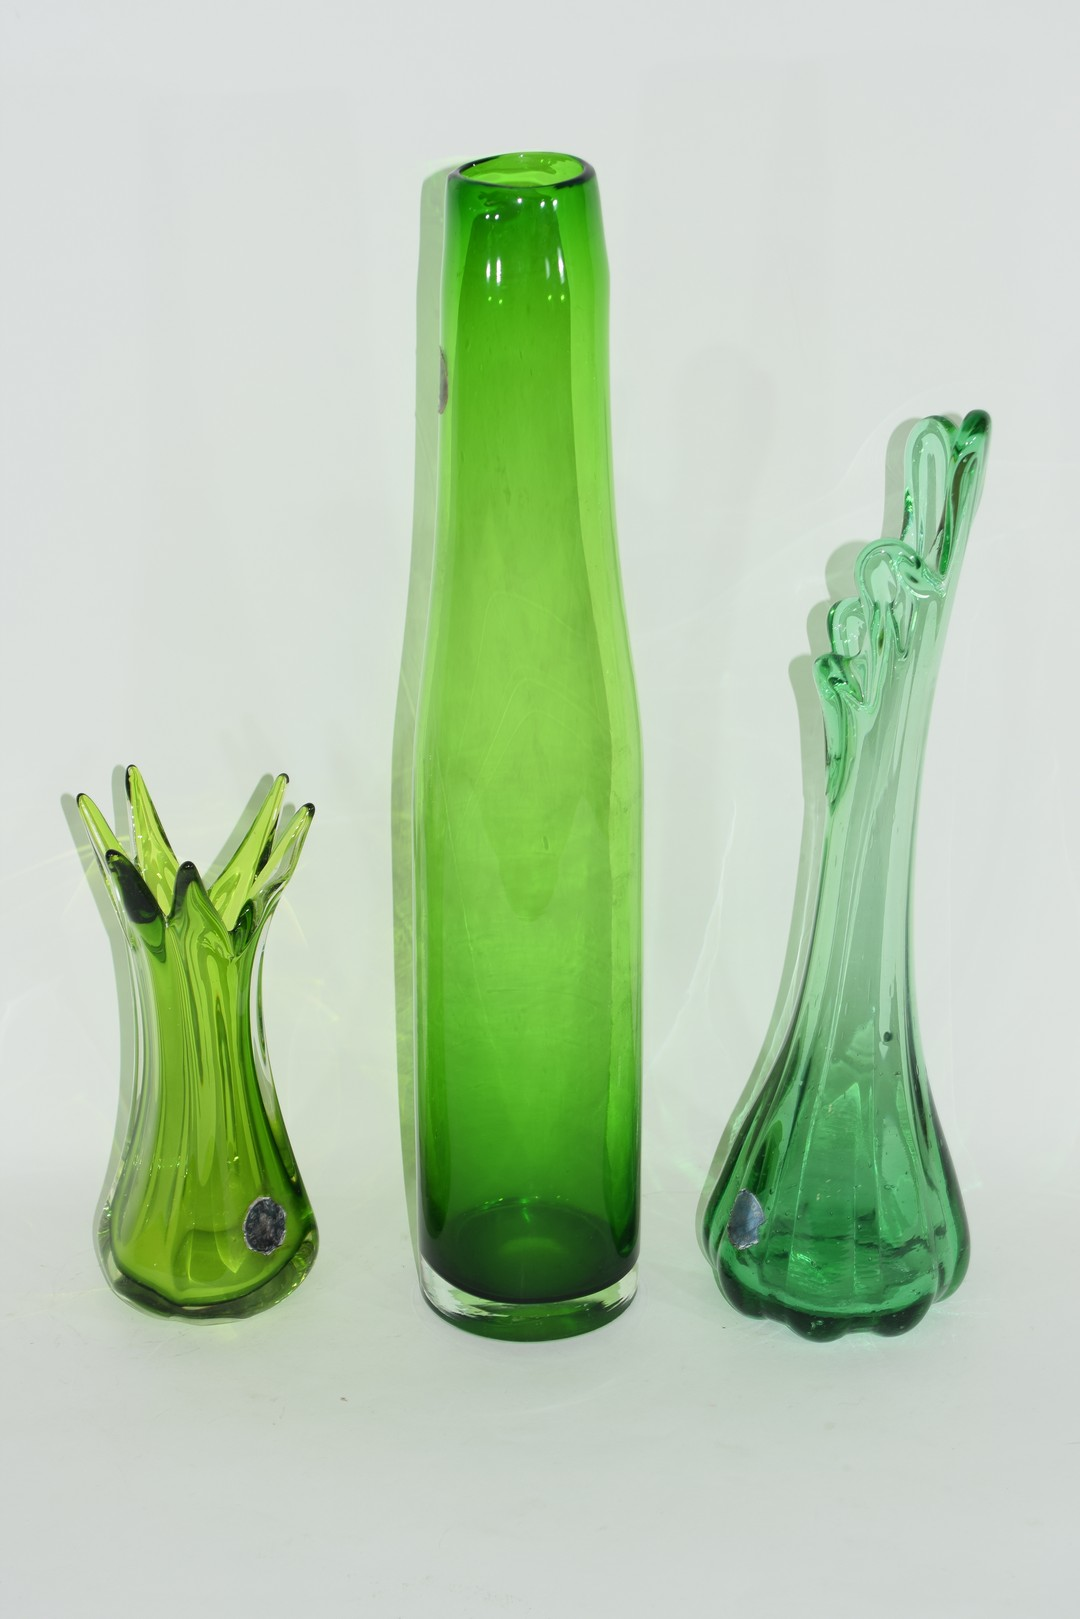 Three Swedish Art glass vases - Image 2 of 3